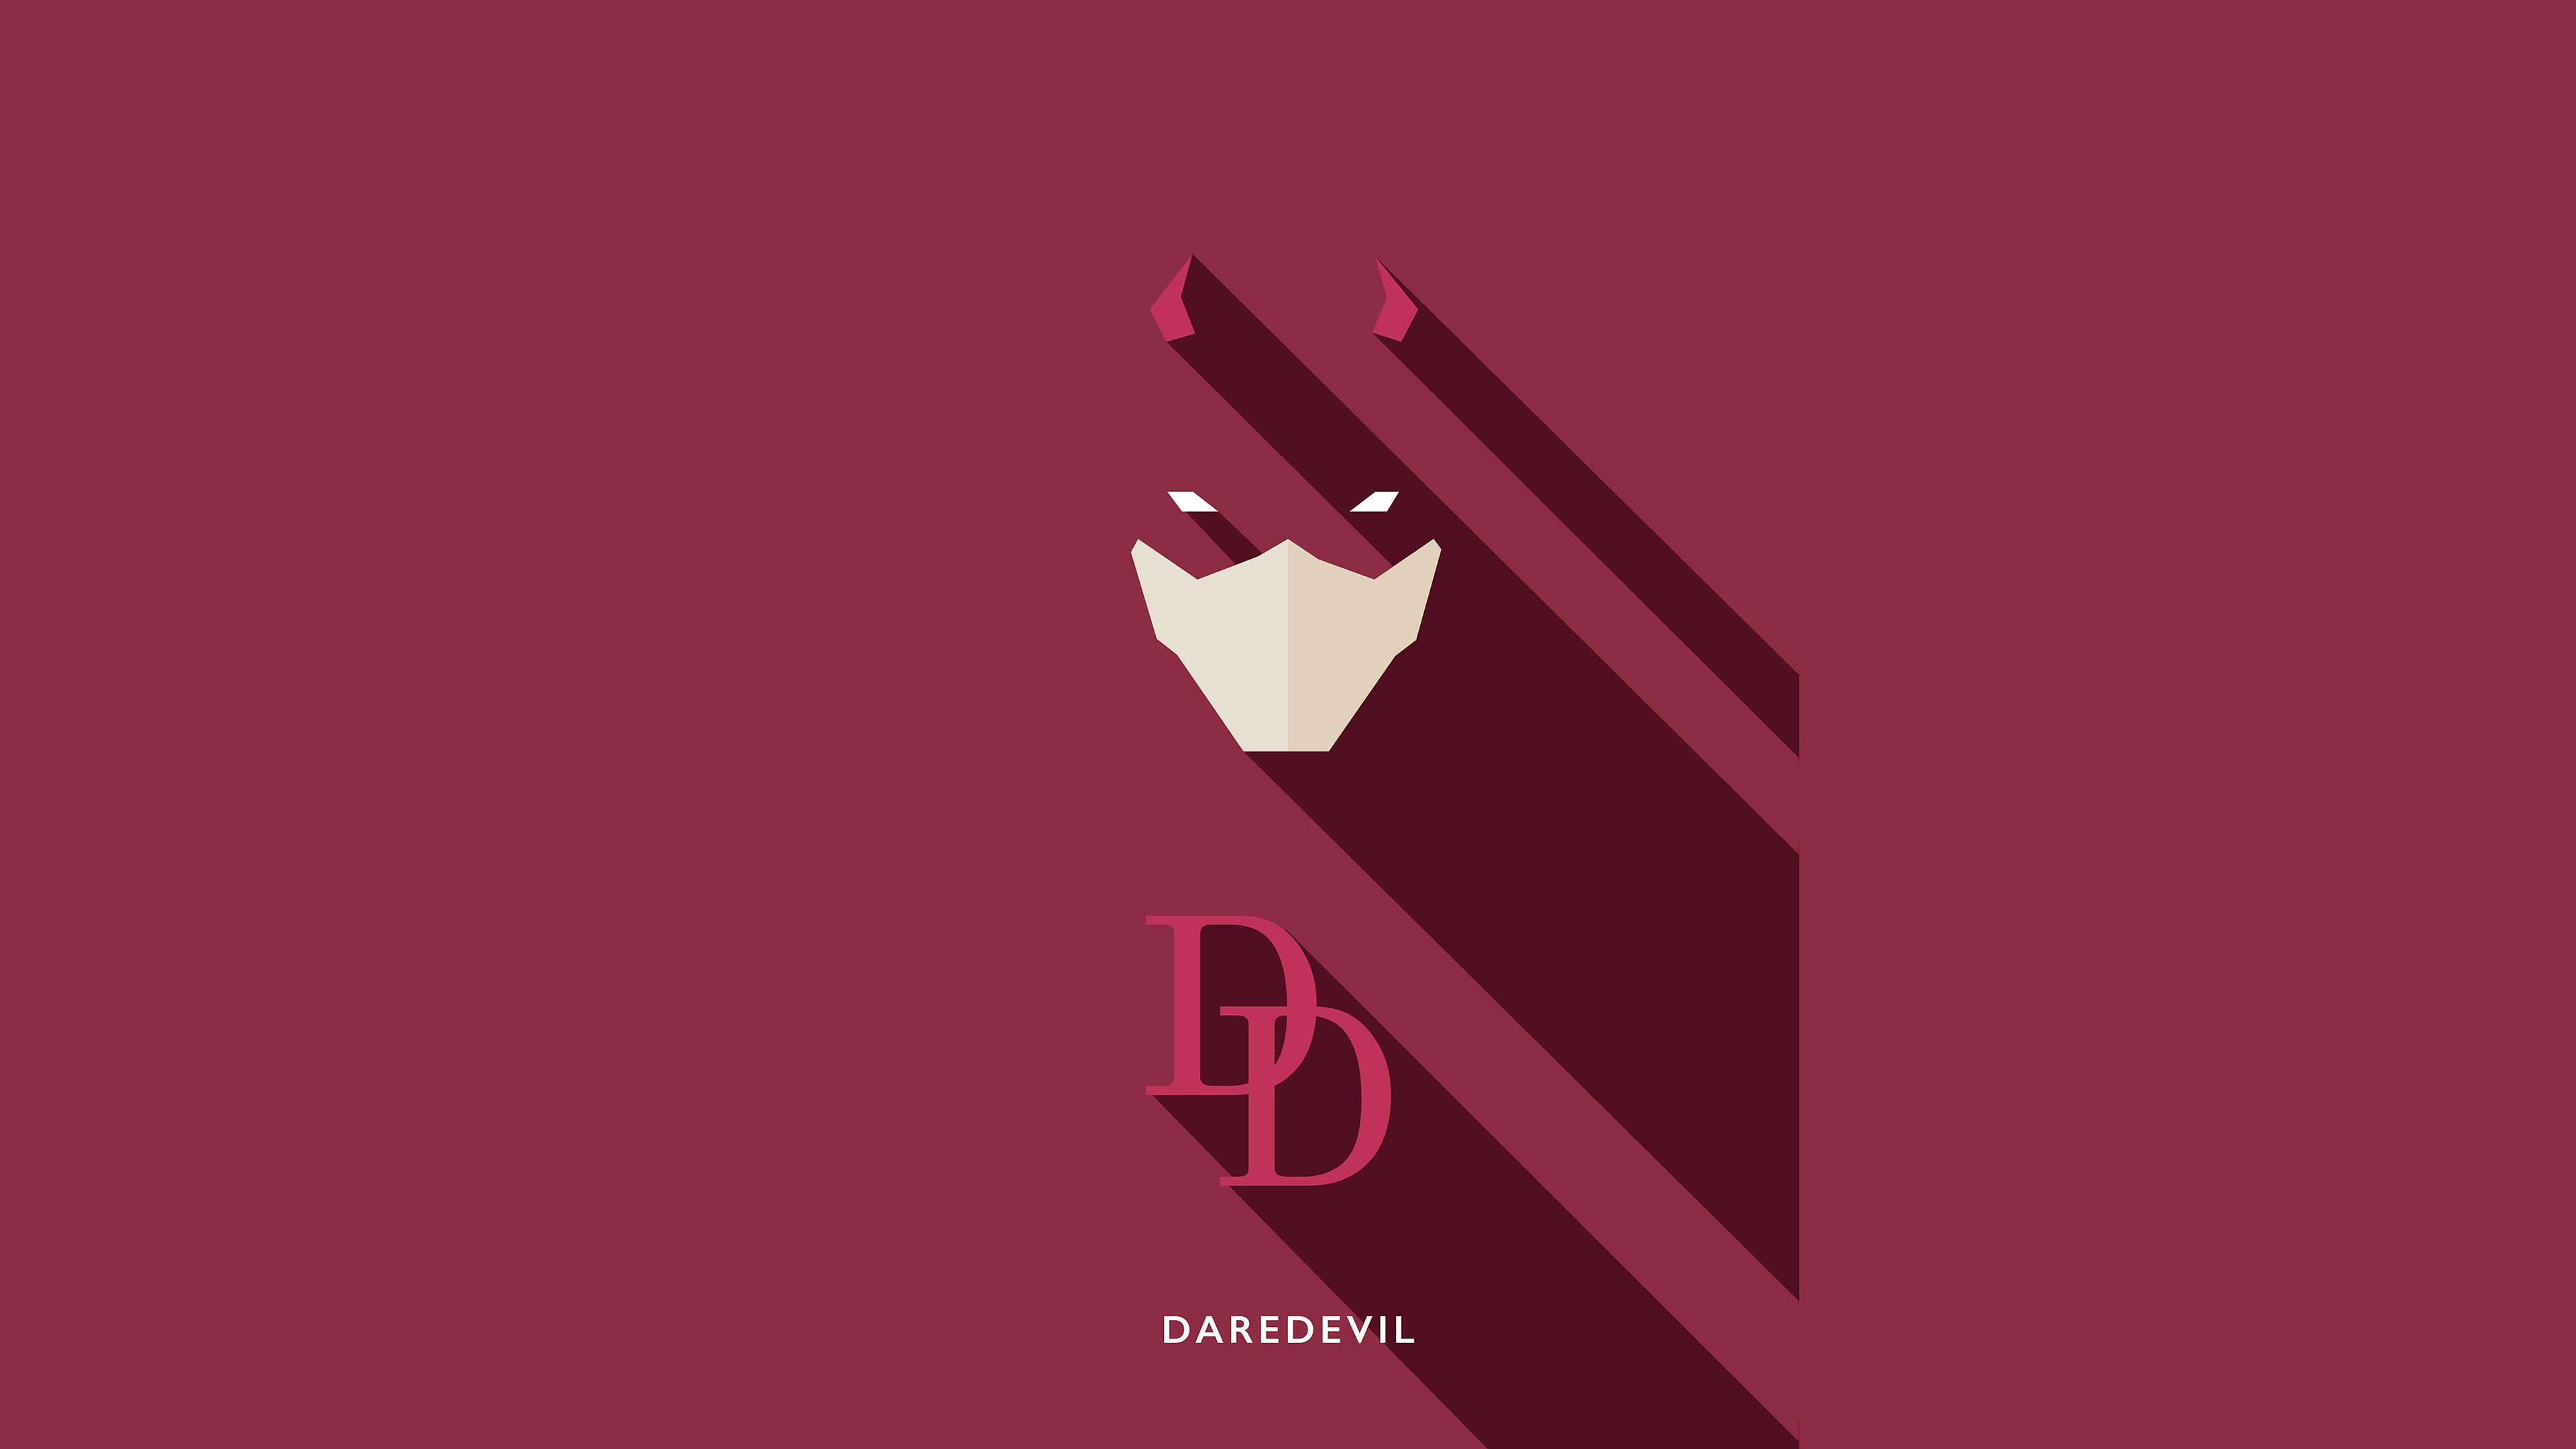 daredevil minimalists 4k 1553071259 - Daredevil Minimalists 4k - superheroes wallpapers, minimalist wallpapers, minimalism wallpapers, hd-wallpapers, digital art wallpapers, daredevil wallpapers, behance wallpapers, artwork wallpapers, artist wallpapers, 4k-wallpapers